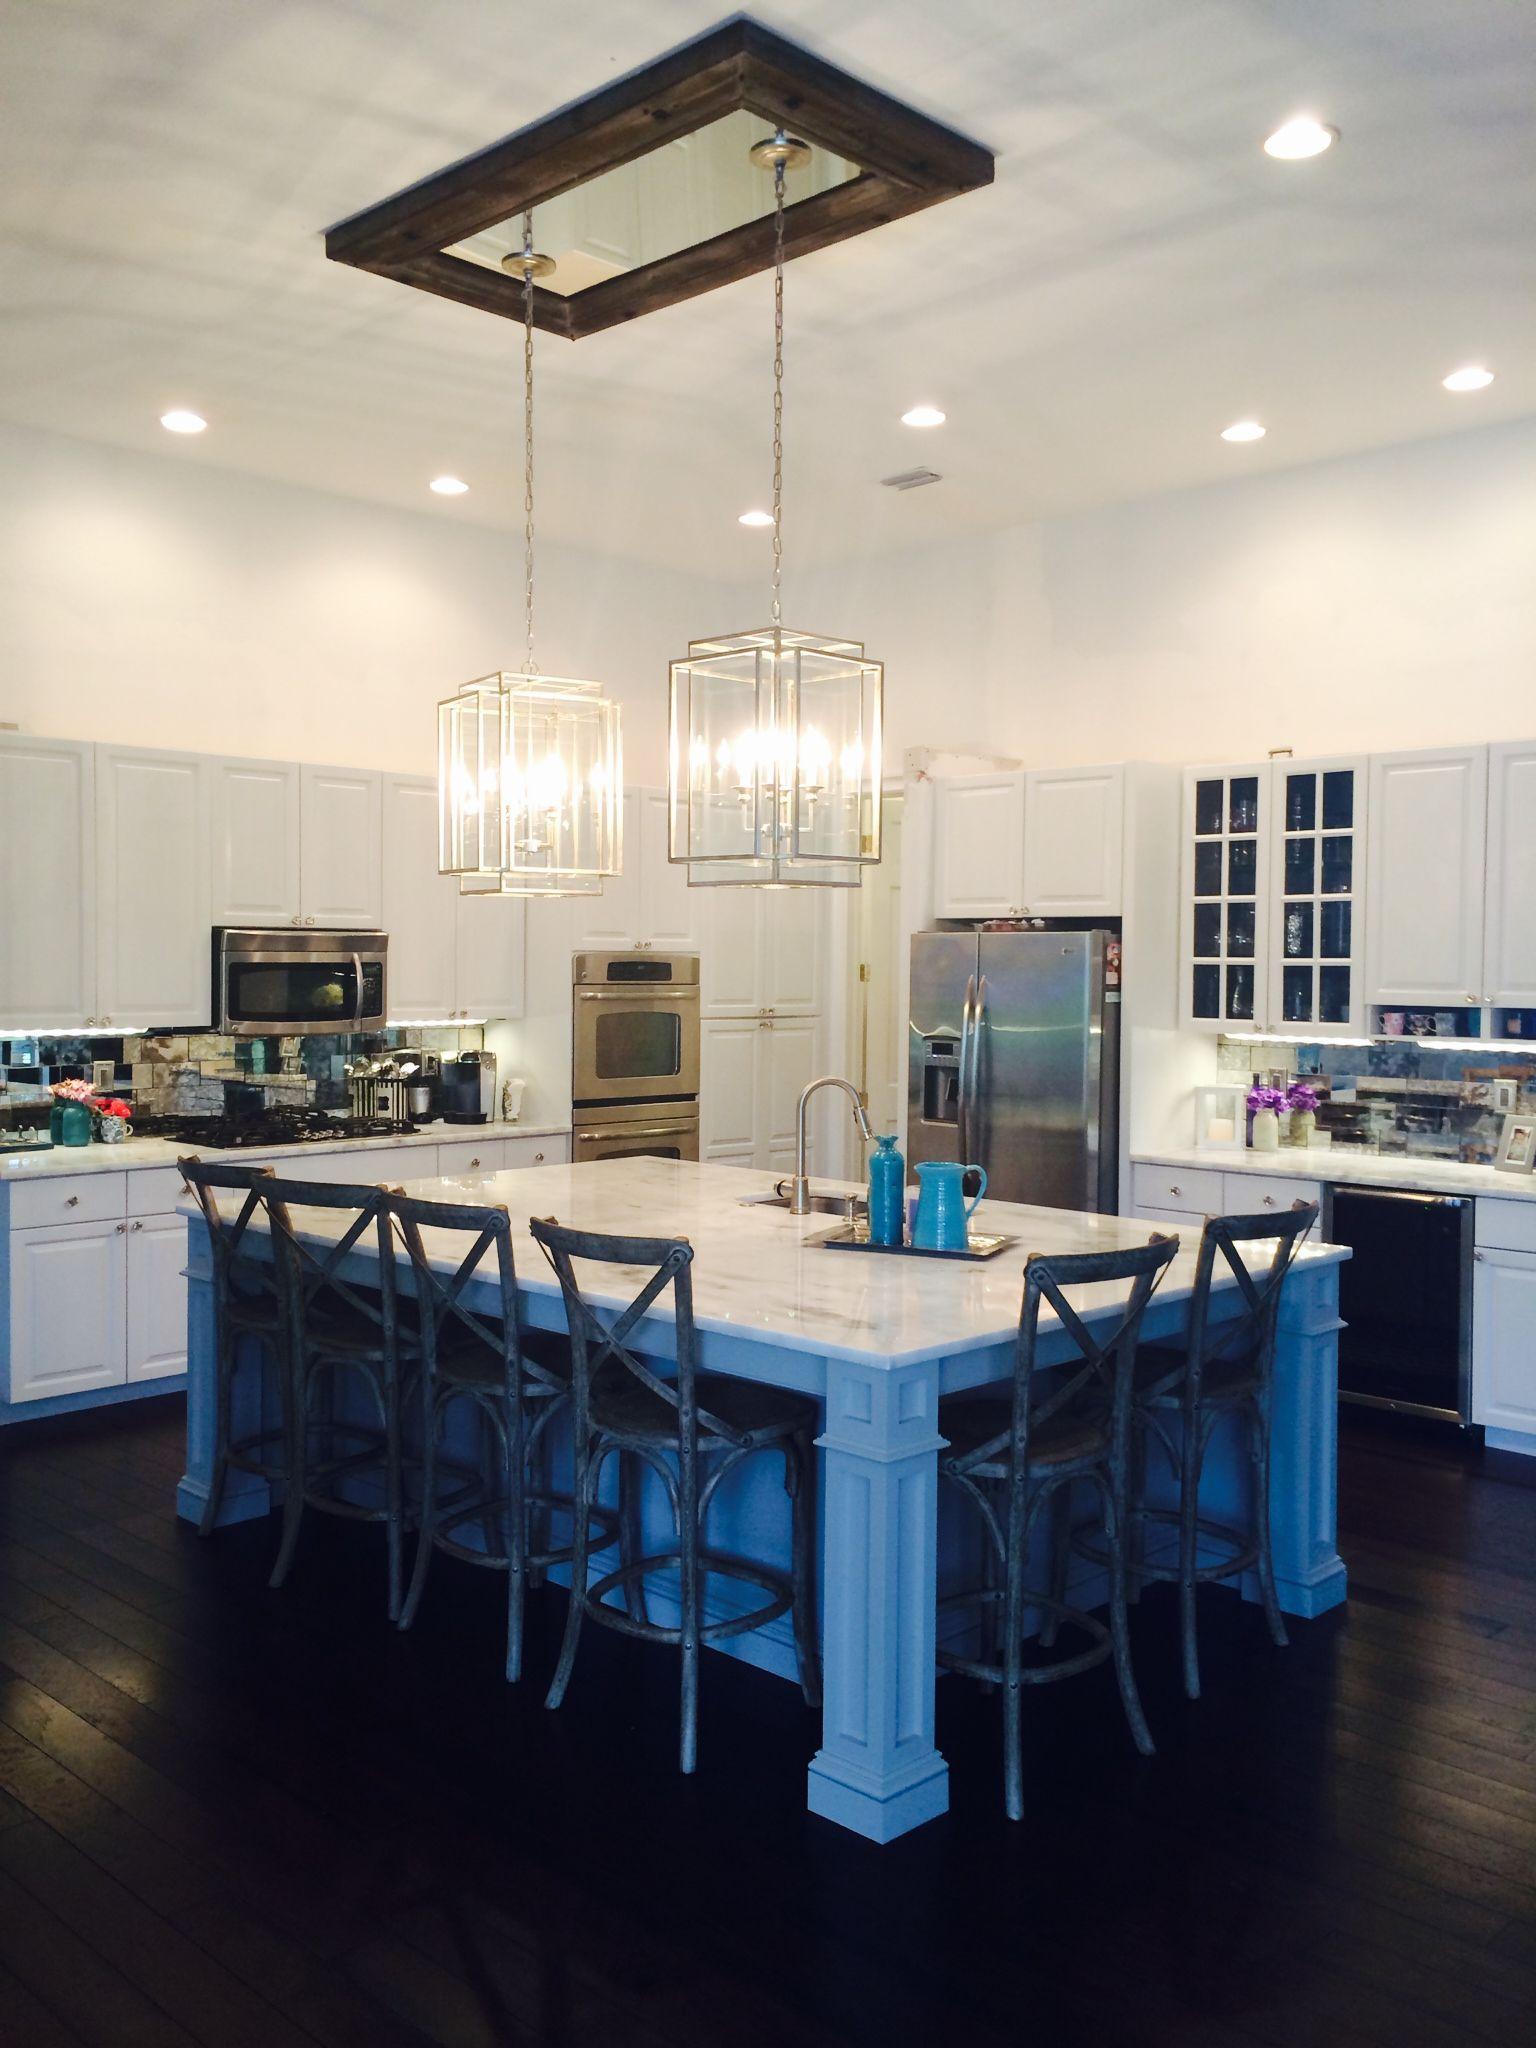 Mirror Ceiling Medallion For Light Fixture Kitchen Lighting Fixtures Ceiling Dining Light